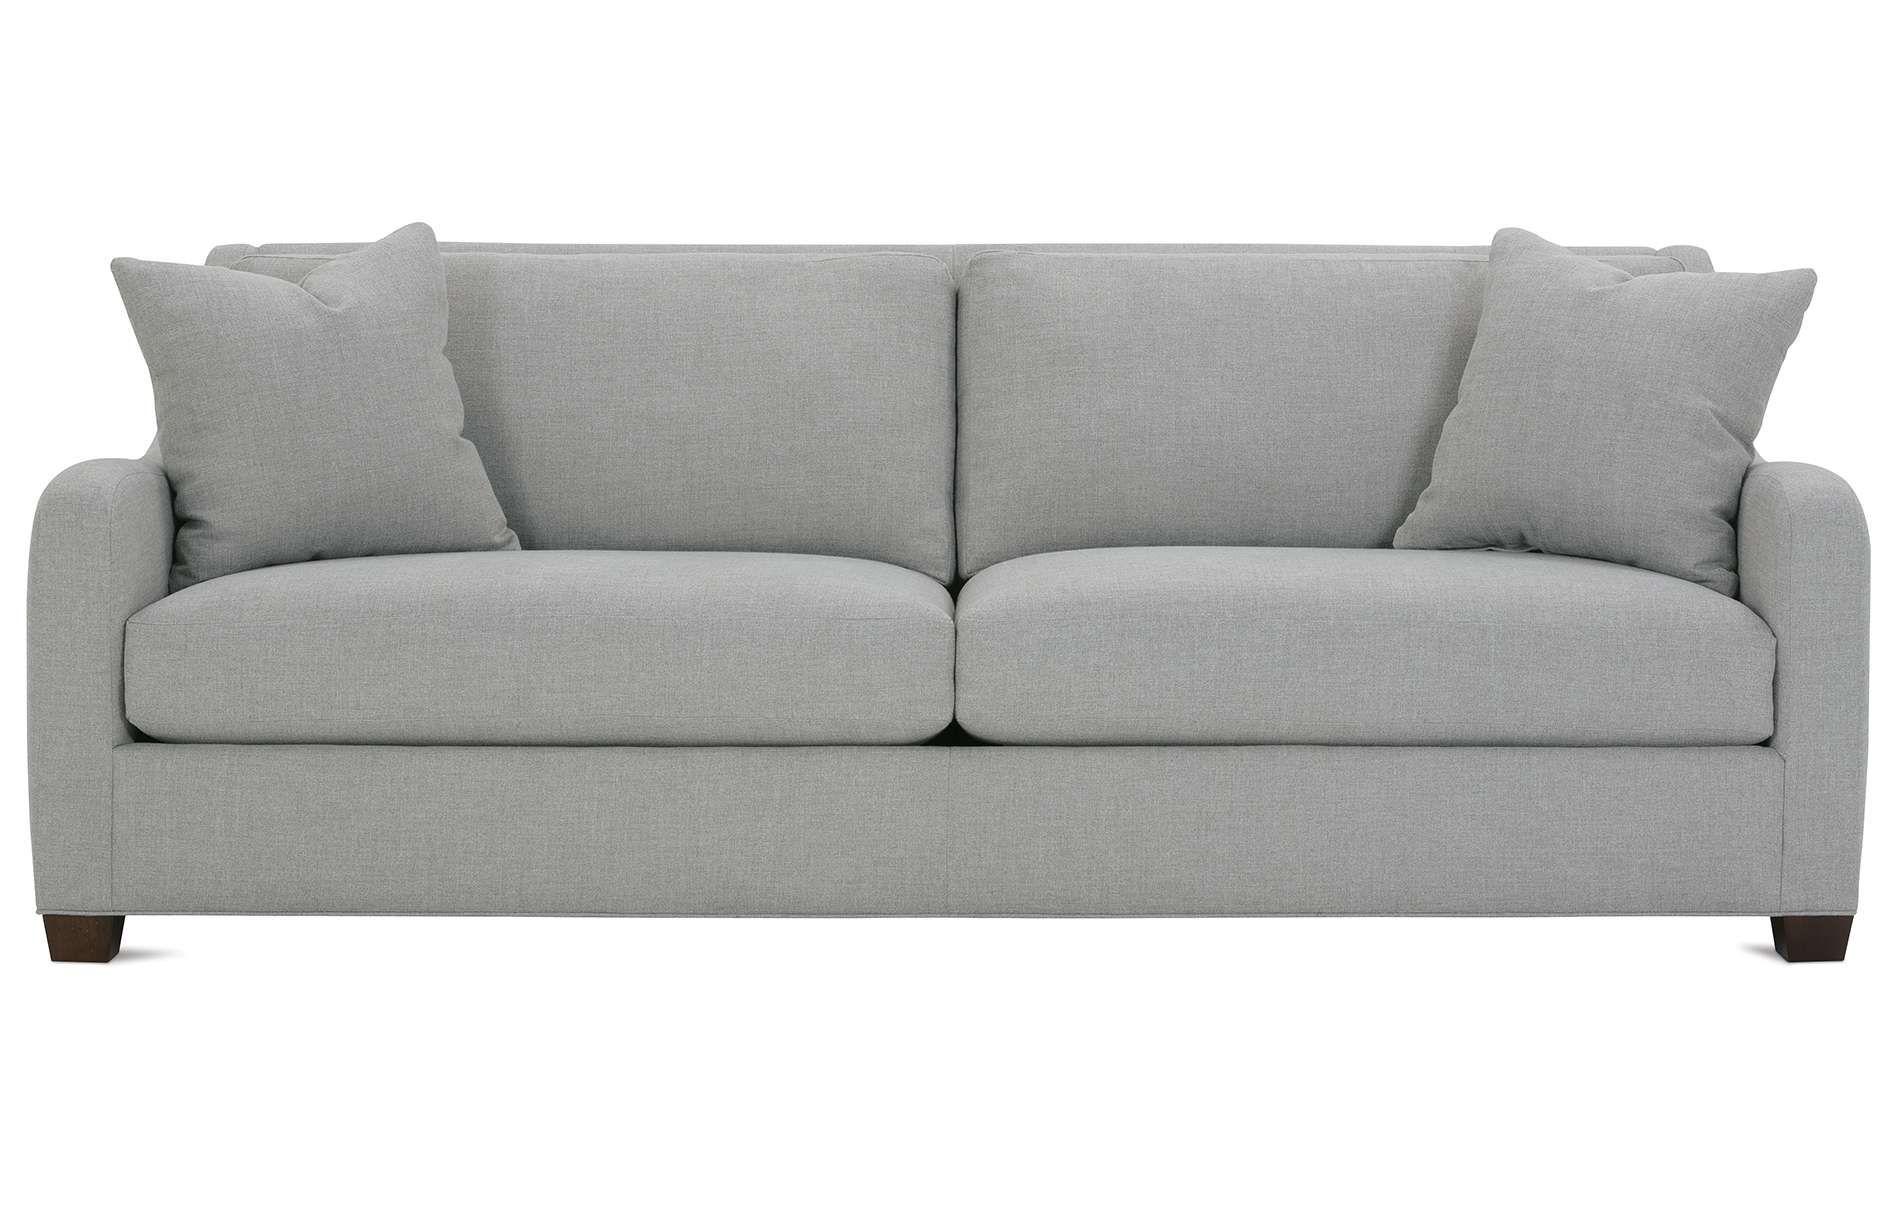 Abbie Sofa   Rowe Furniture